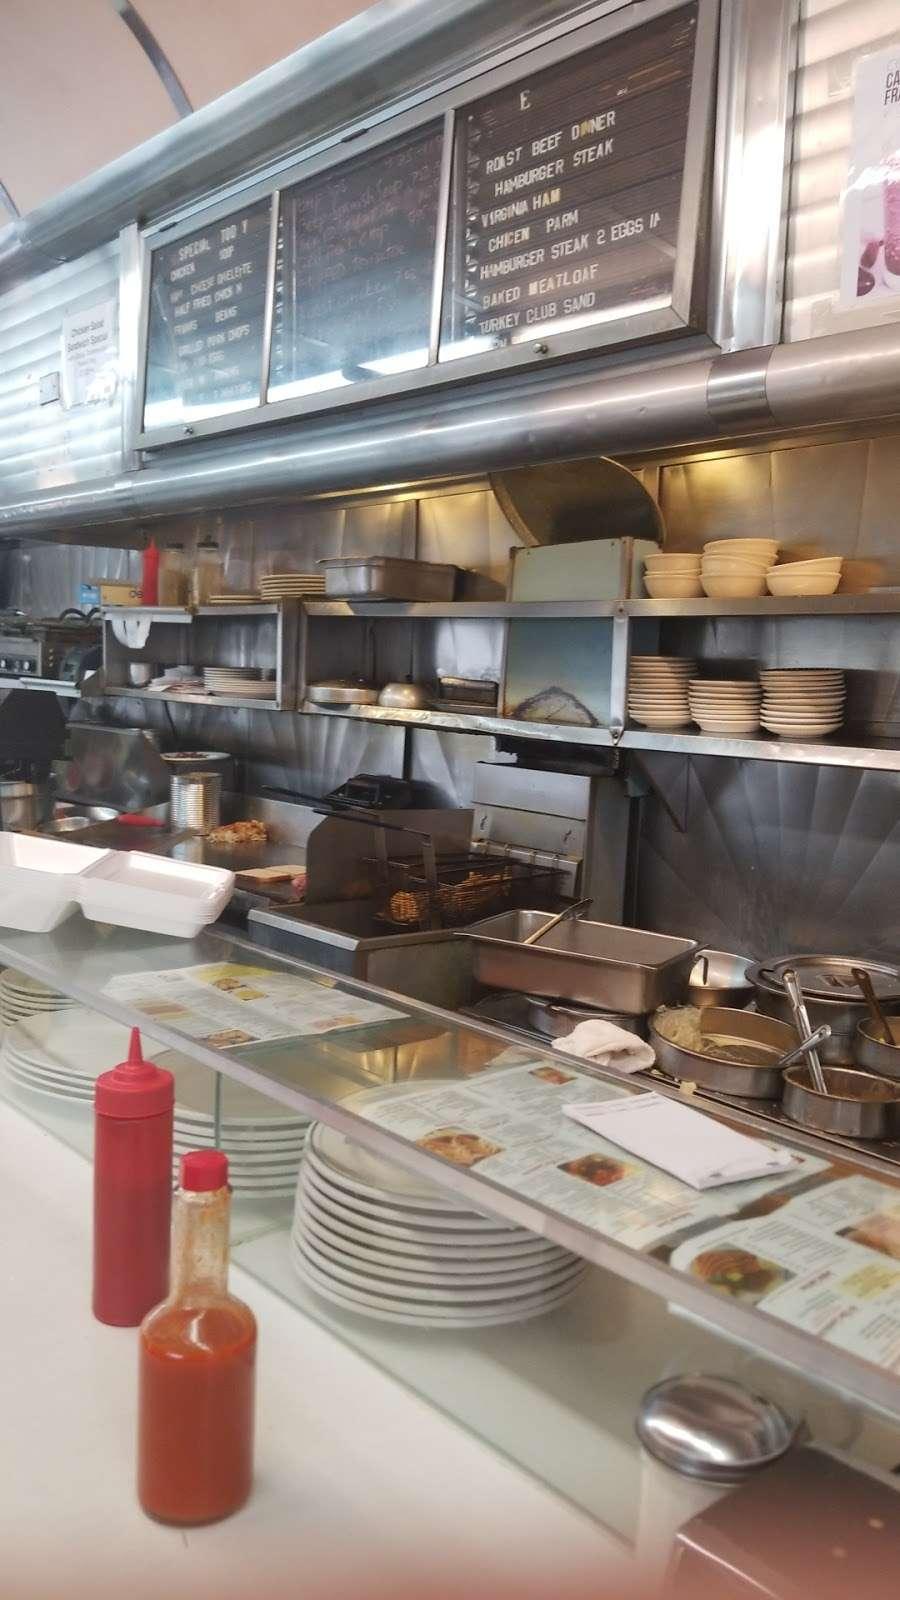 Truck Stop Diner - restaurant  | Photo 7 of 10 | Address: 1 Hackensack Ave, Kearny, NJ 07032, USA | Phone: (973) 344-4098